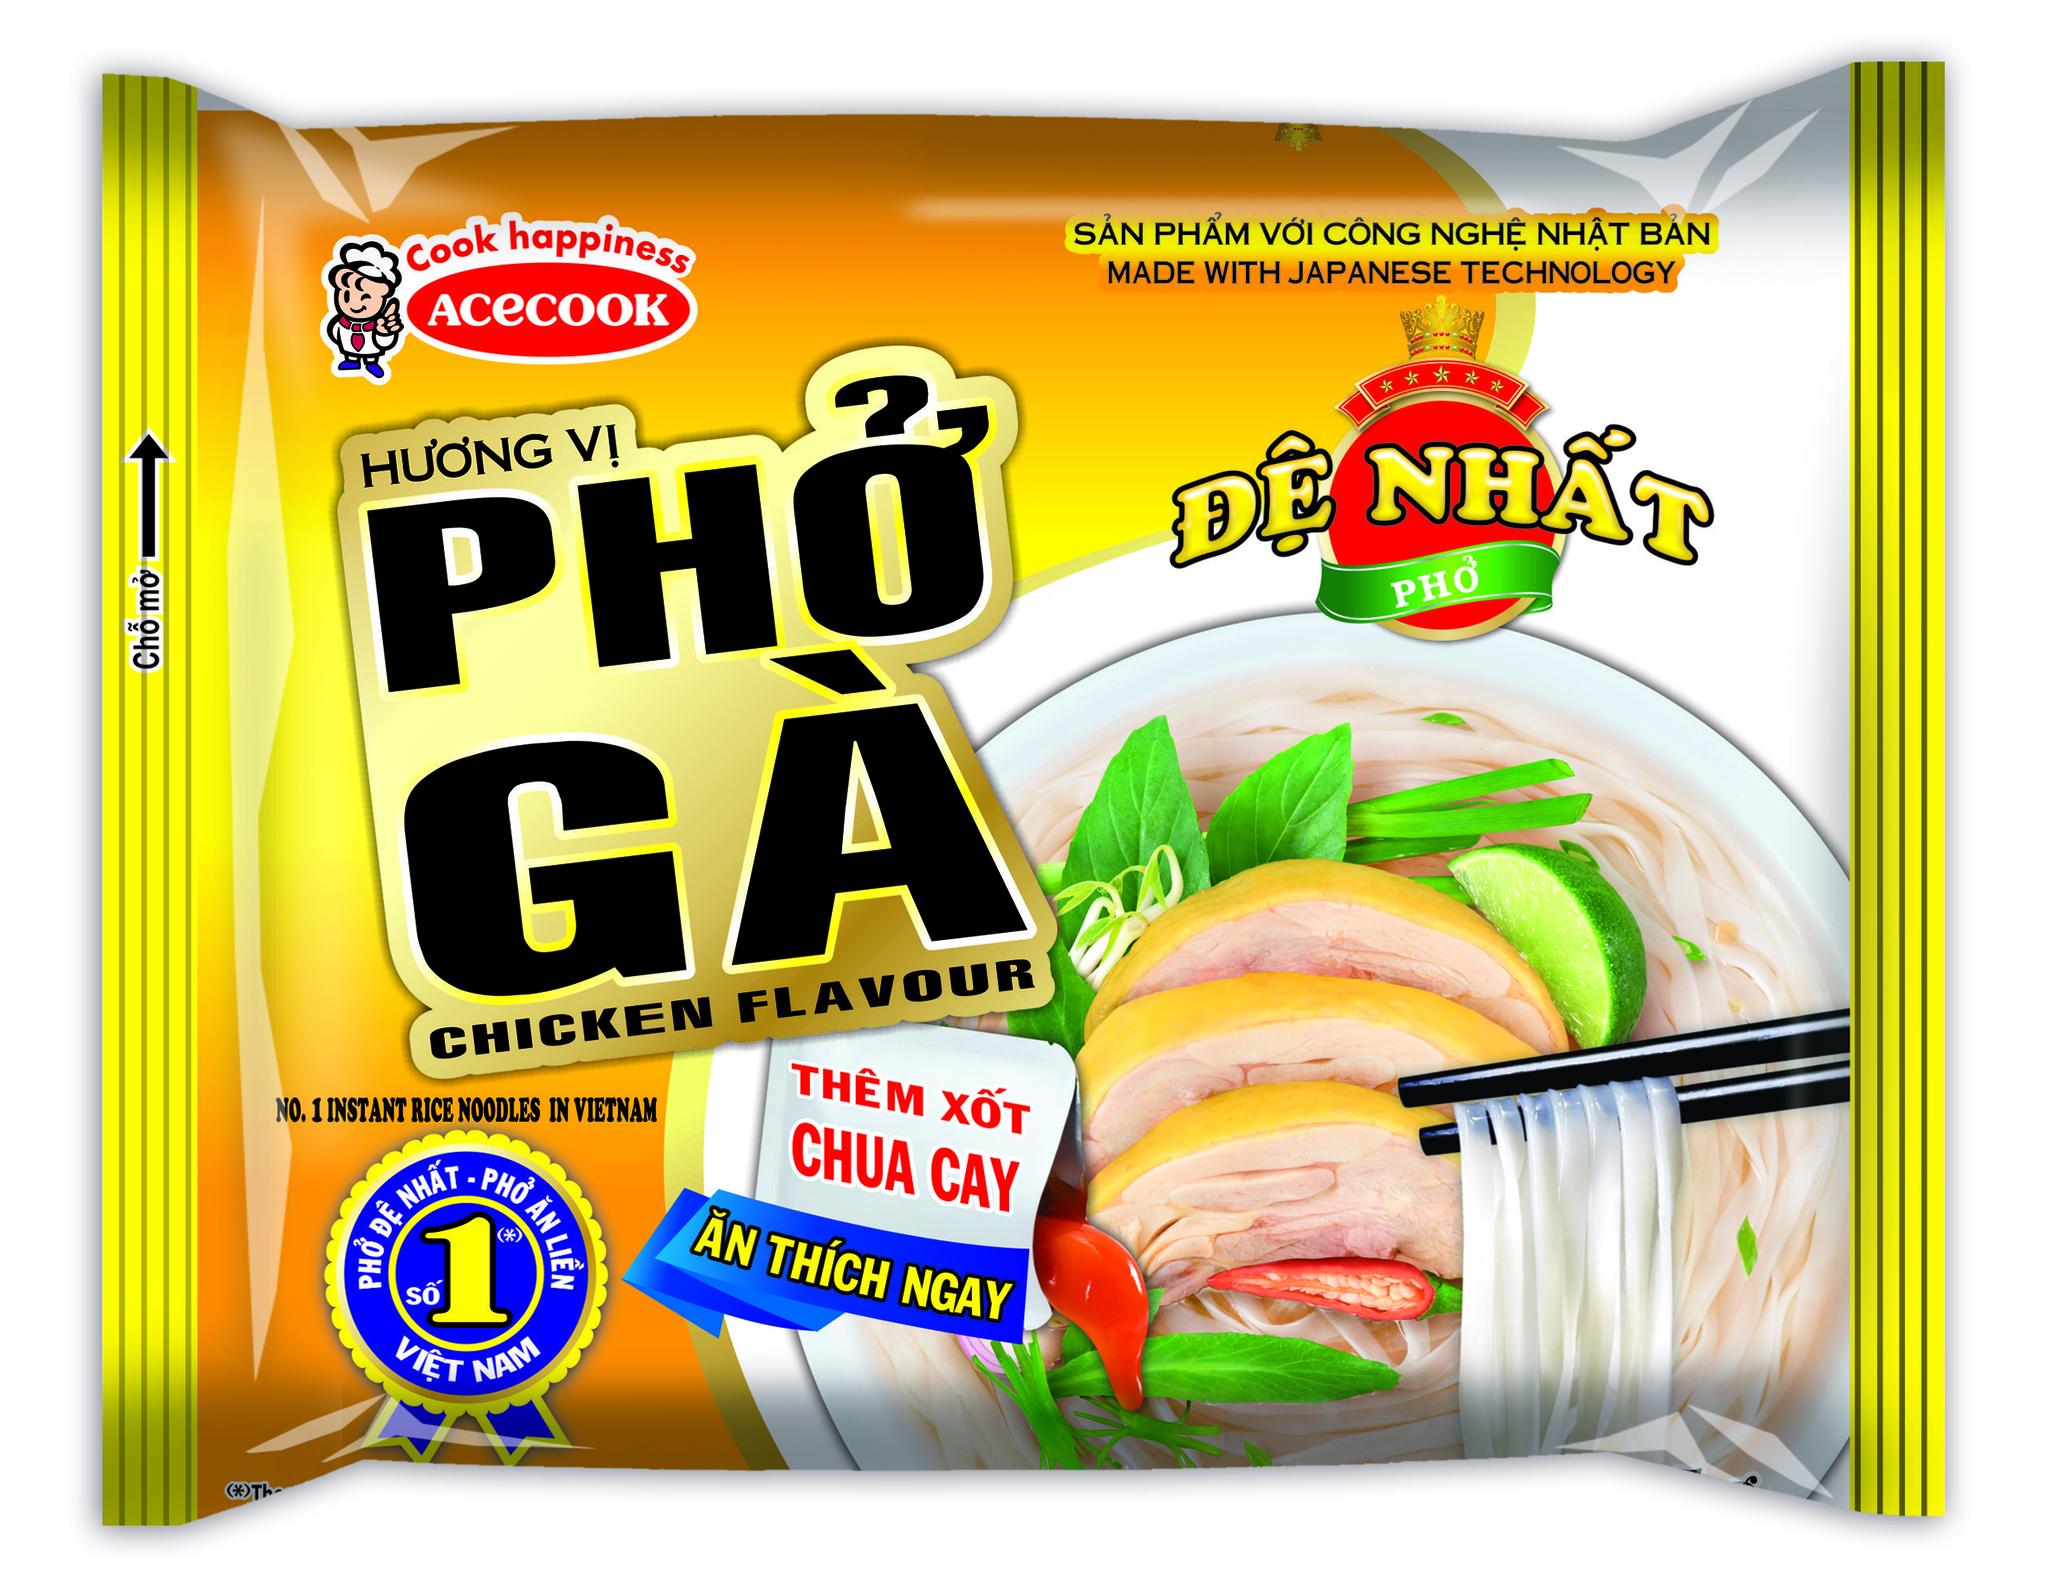 Вьетнамская рисовая лапша Фо Га, De Nhat, вкус курицы, 65 гр.